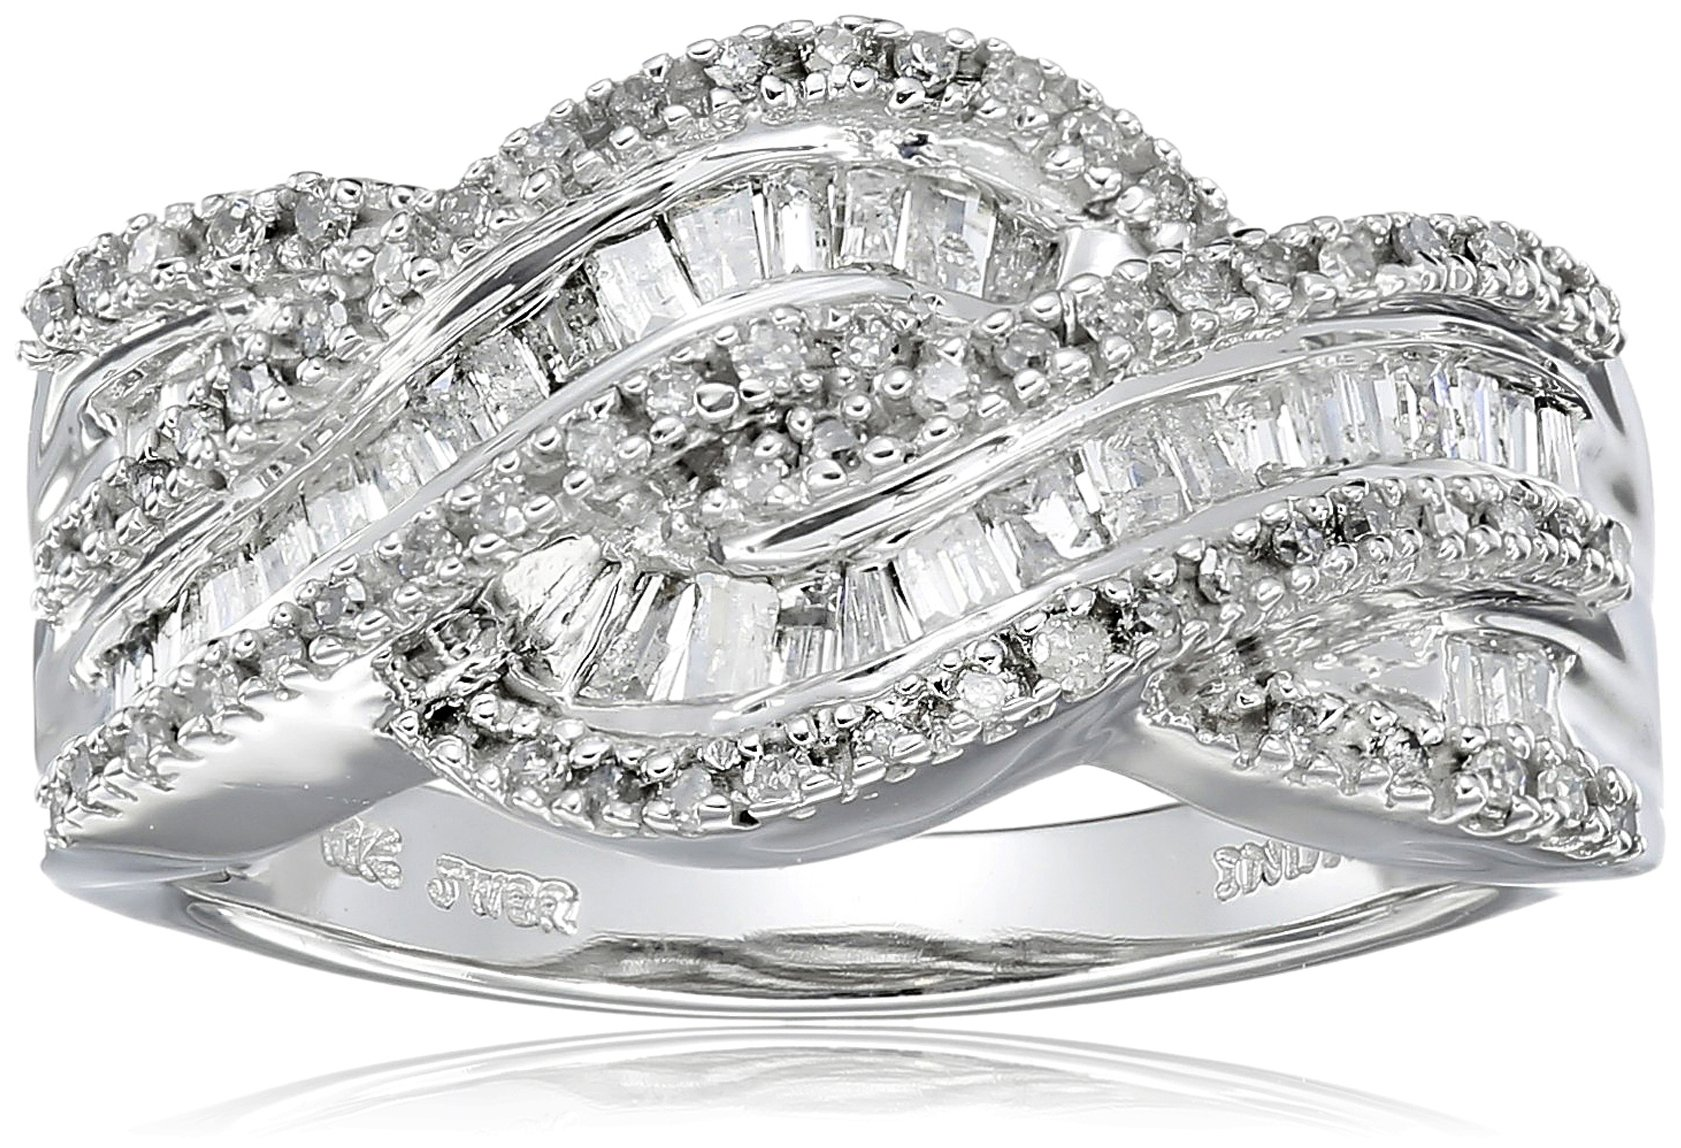 10K White Gold Diamond Twist Band Ring (1/2 cttw), Size 7